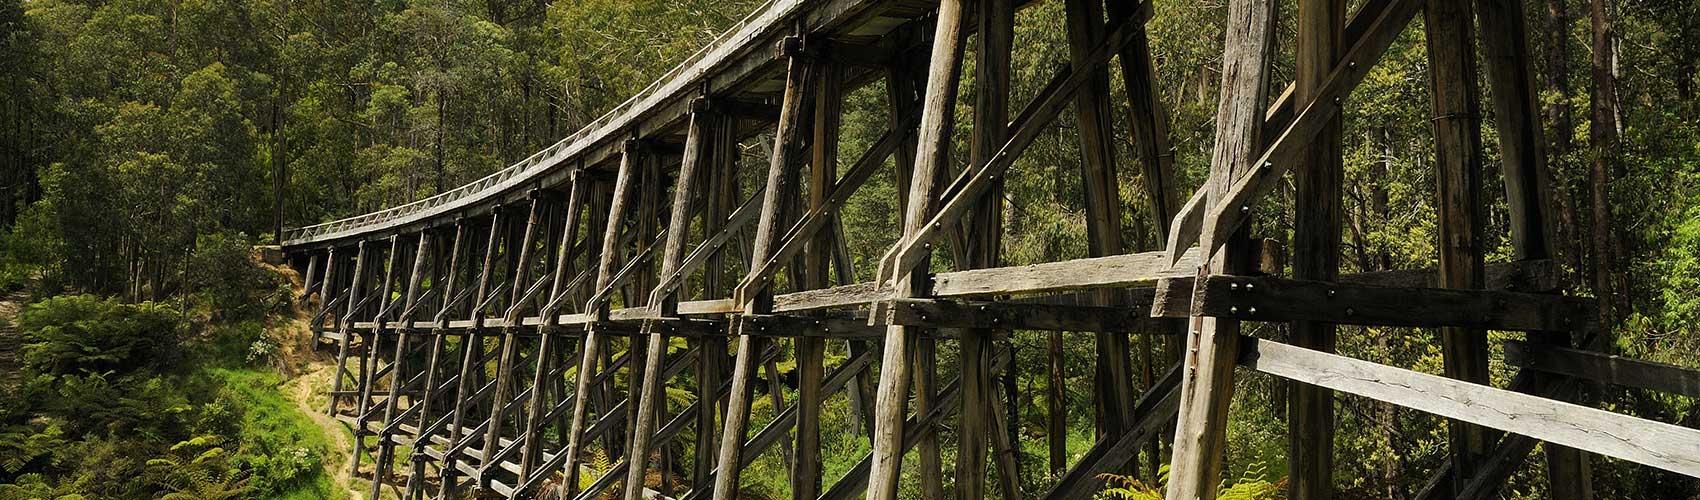 Wooden Trestle Bridge in West Gippsland